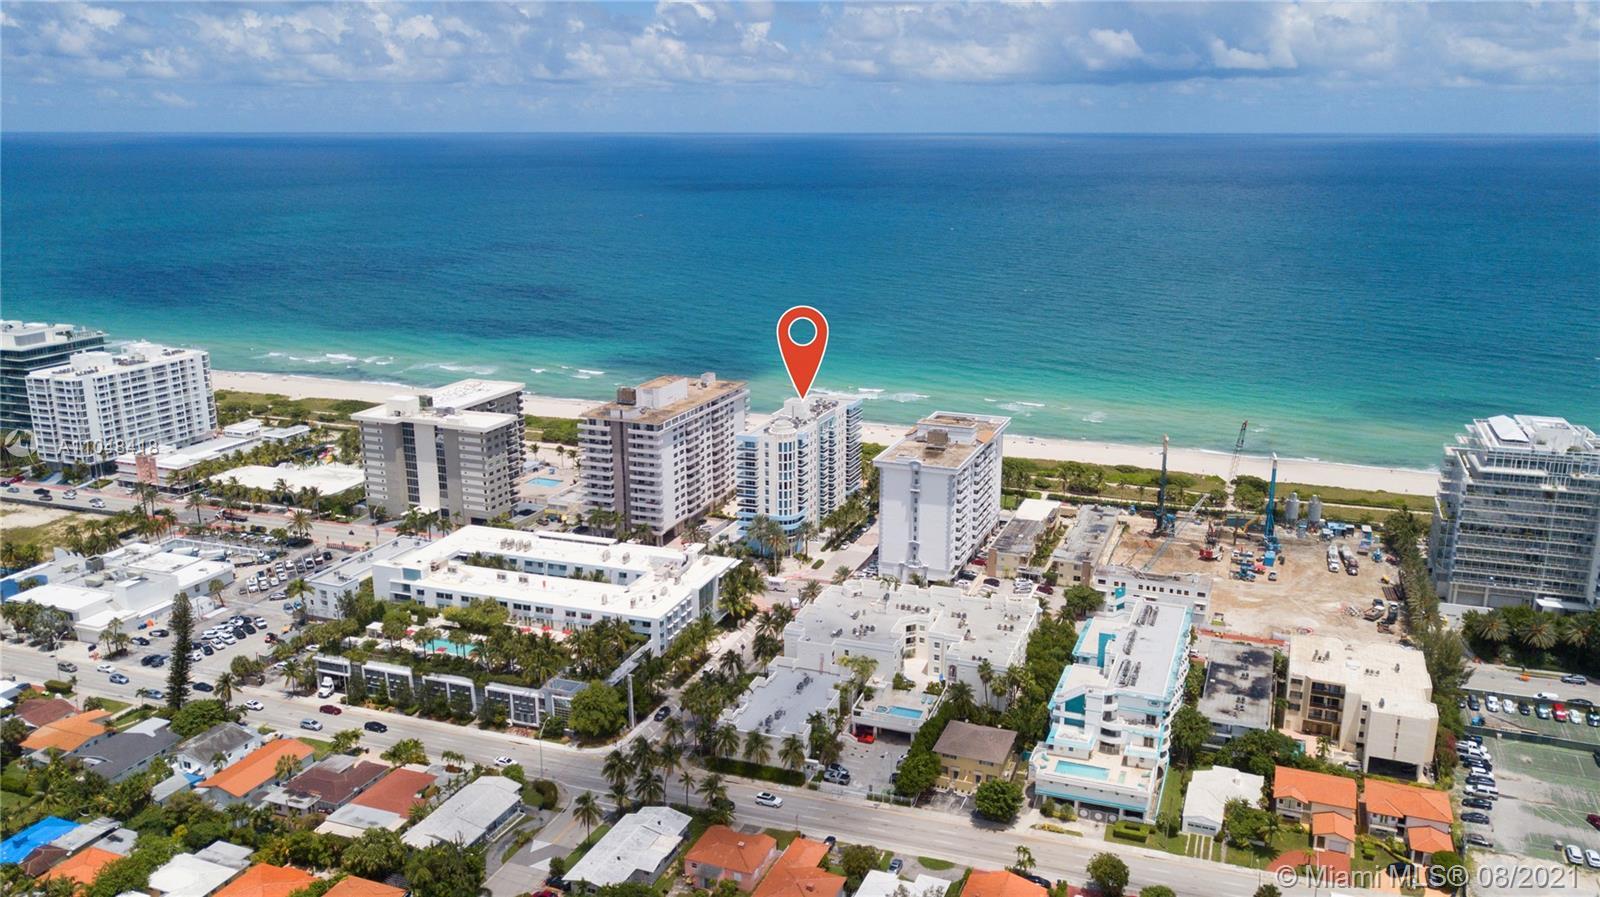 9201 Collins Ave Unit 826, Surfside, Florida 33154